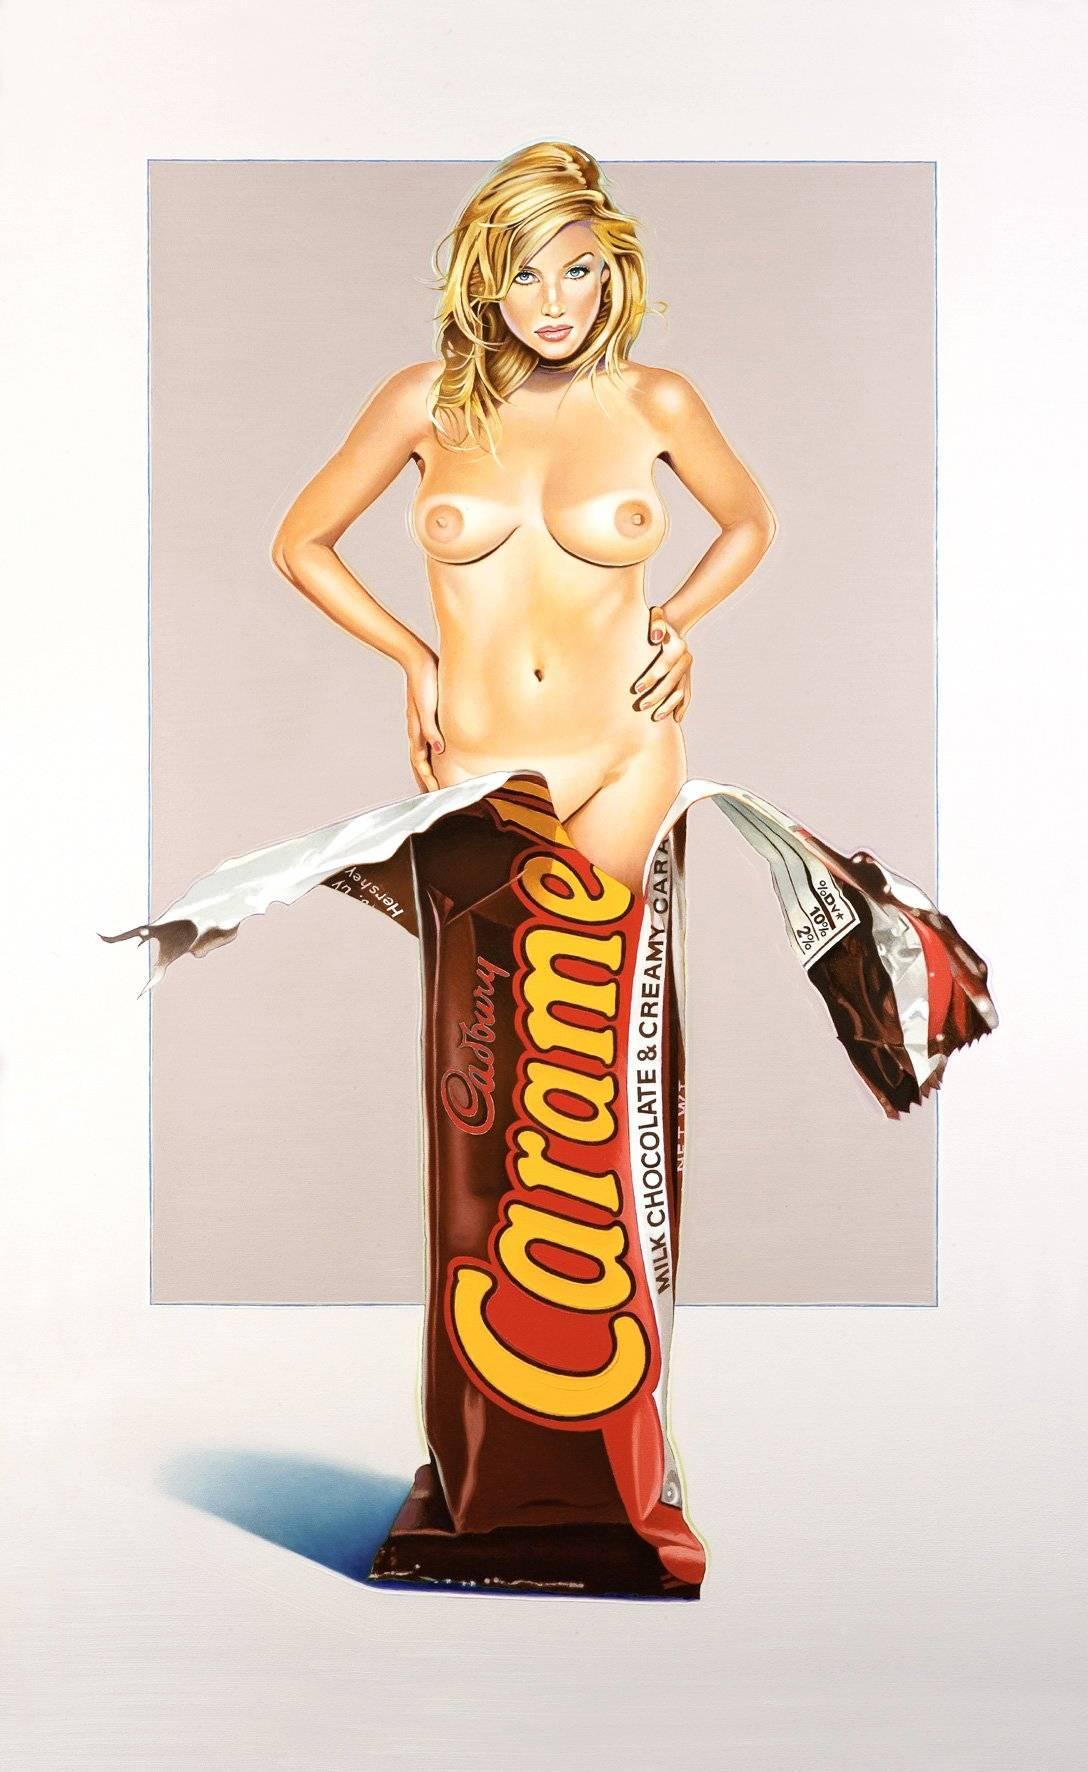 Caramia Caramello, Pop Art, Nude, American Artist, 21st Century